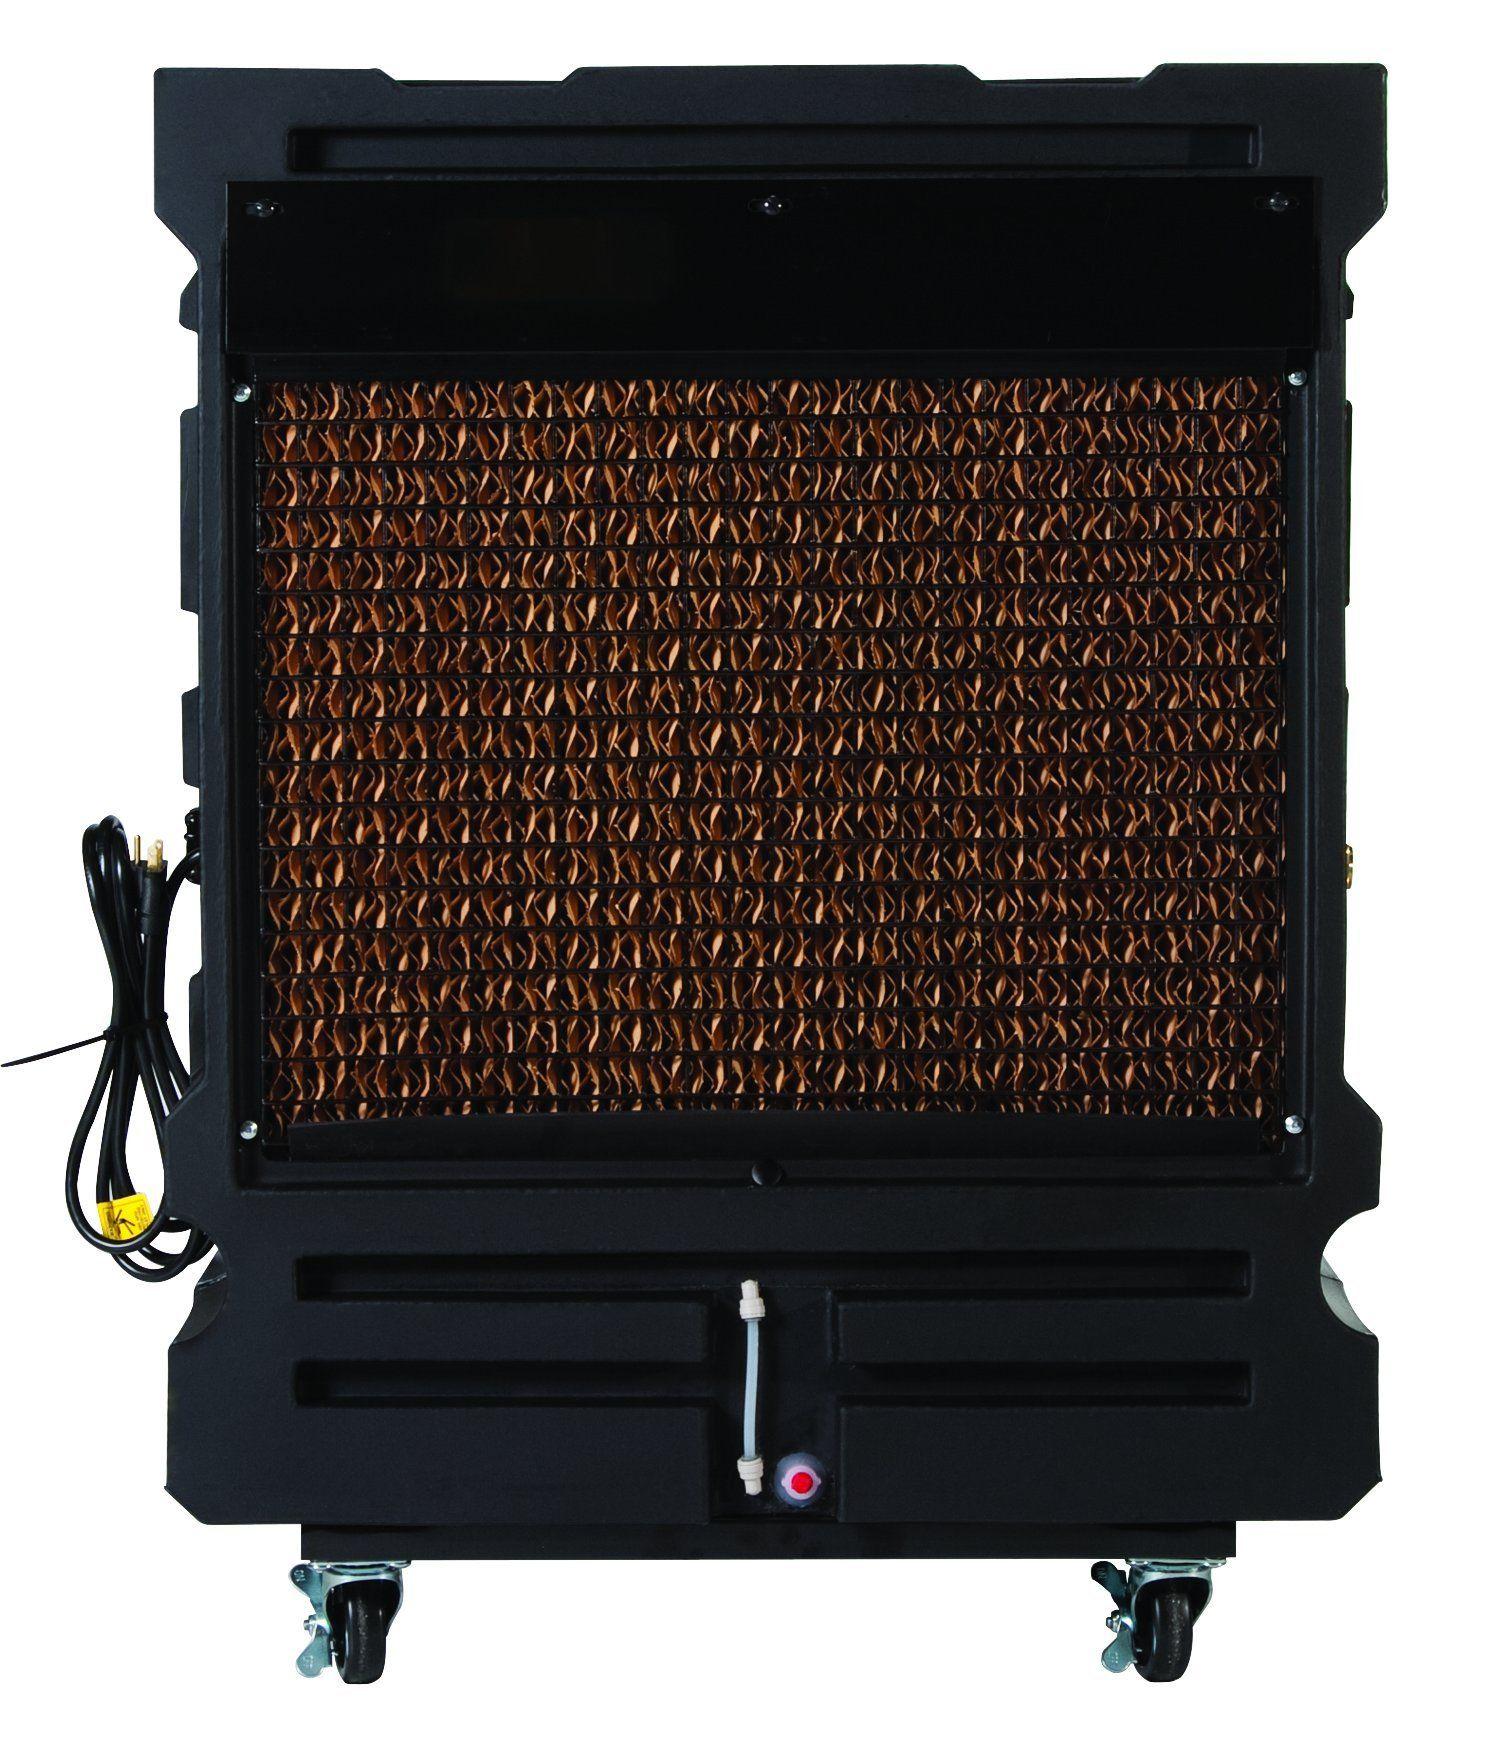 Portacool PAC2KCYC01 Cyclone 3000 Portable Evaporative